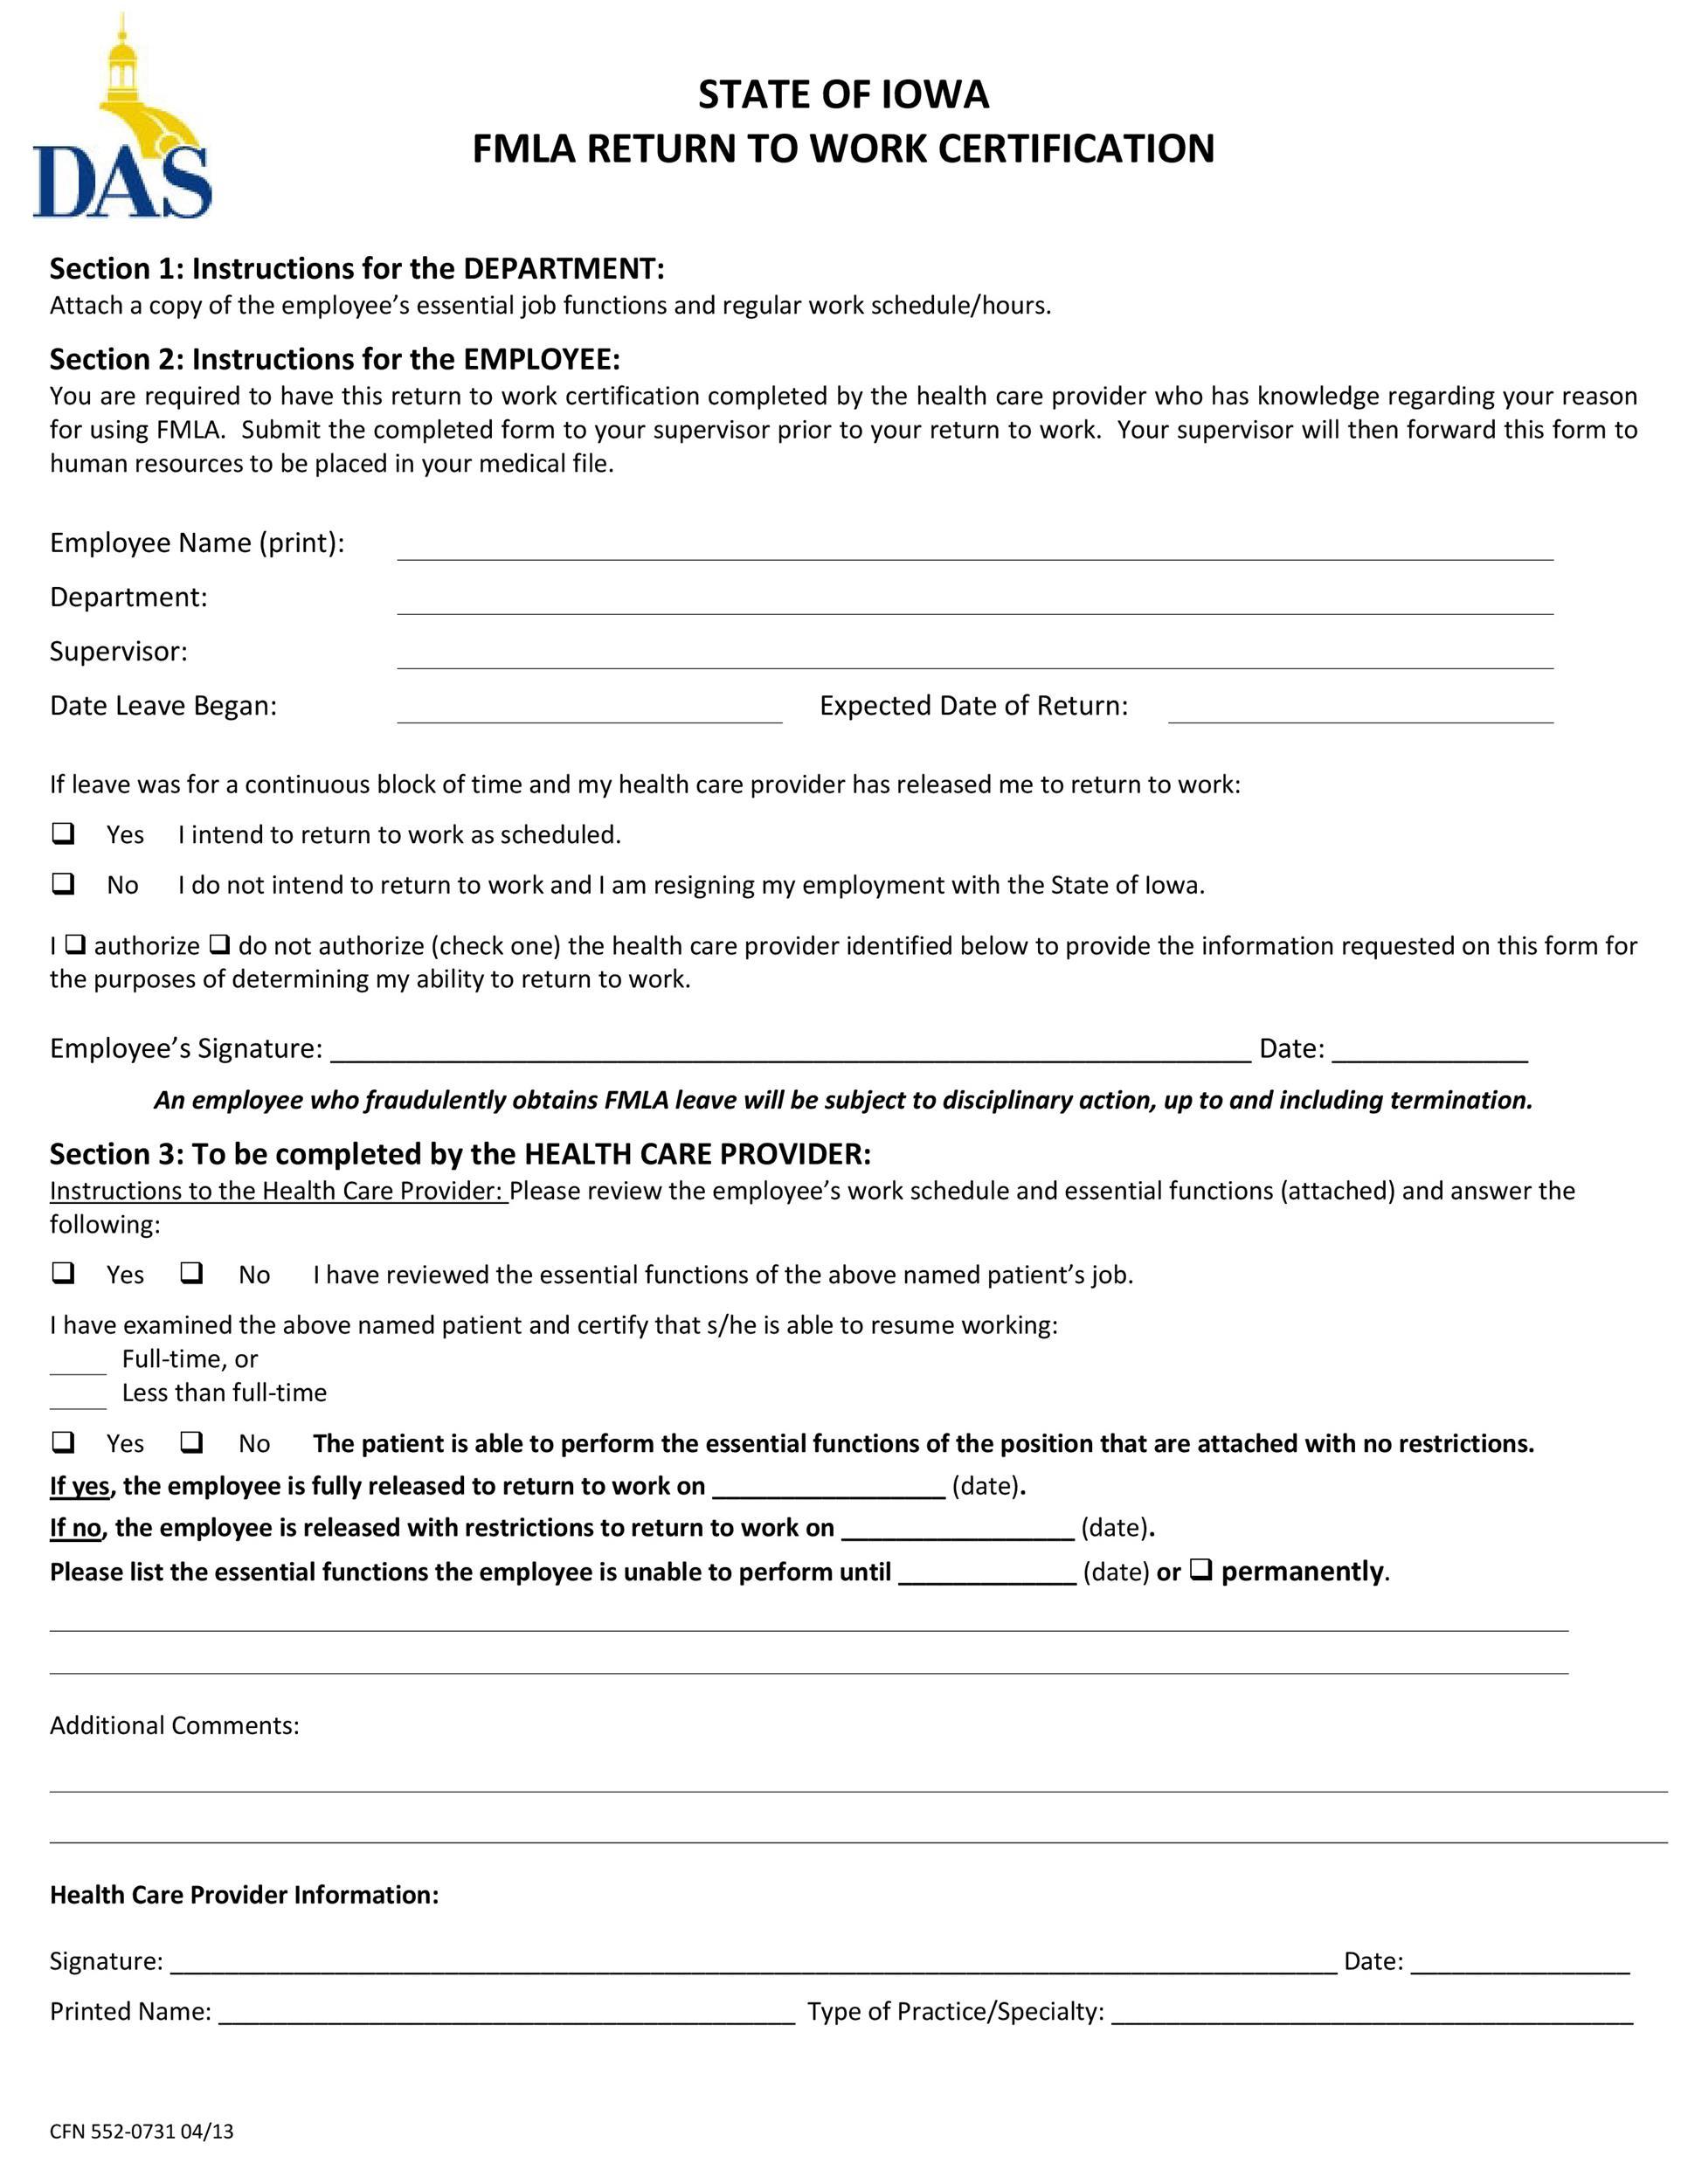 Free return to work form 32